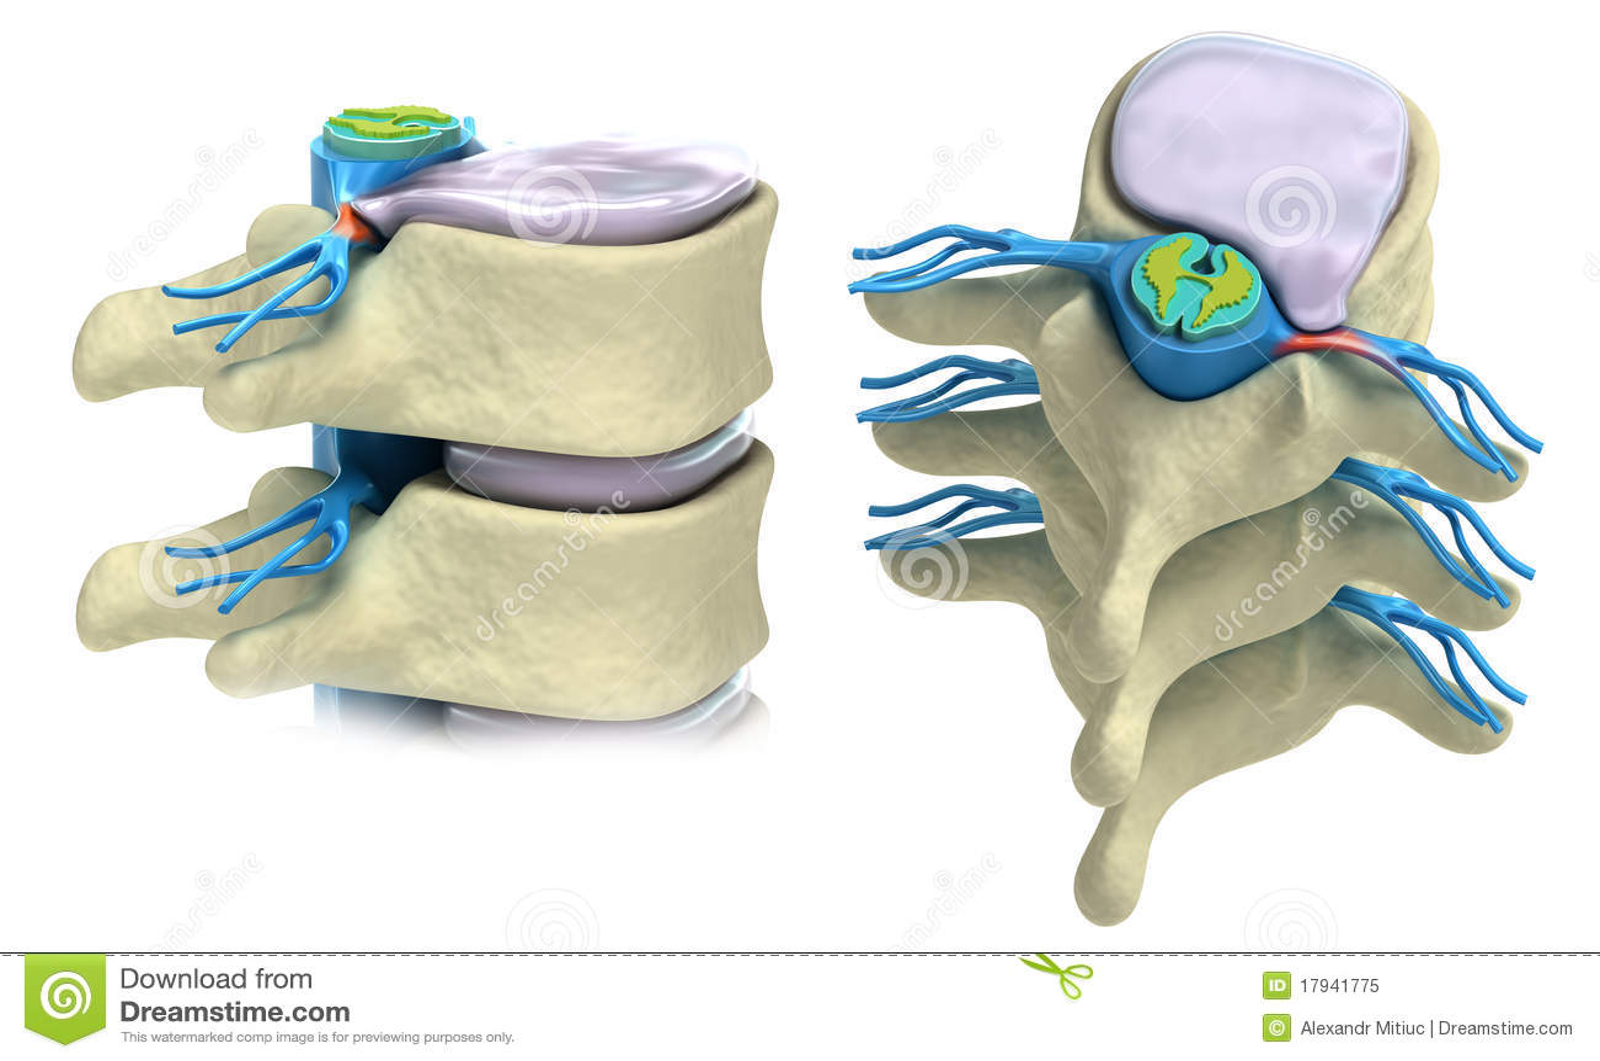 Prolapso do disco intervertebral